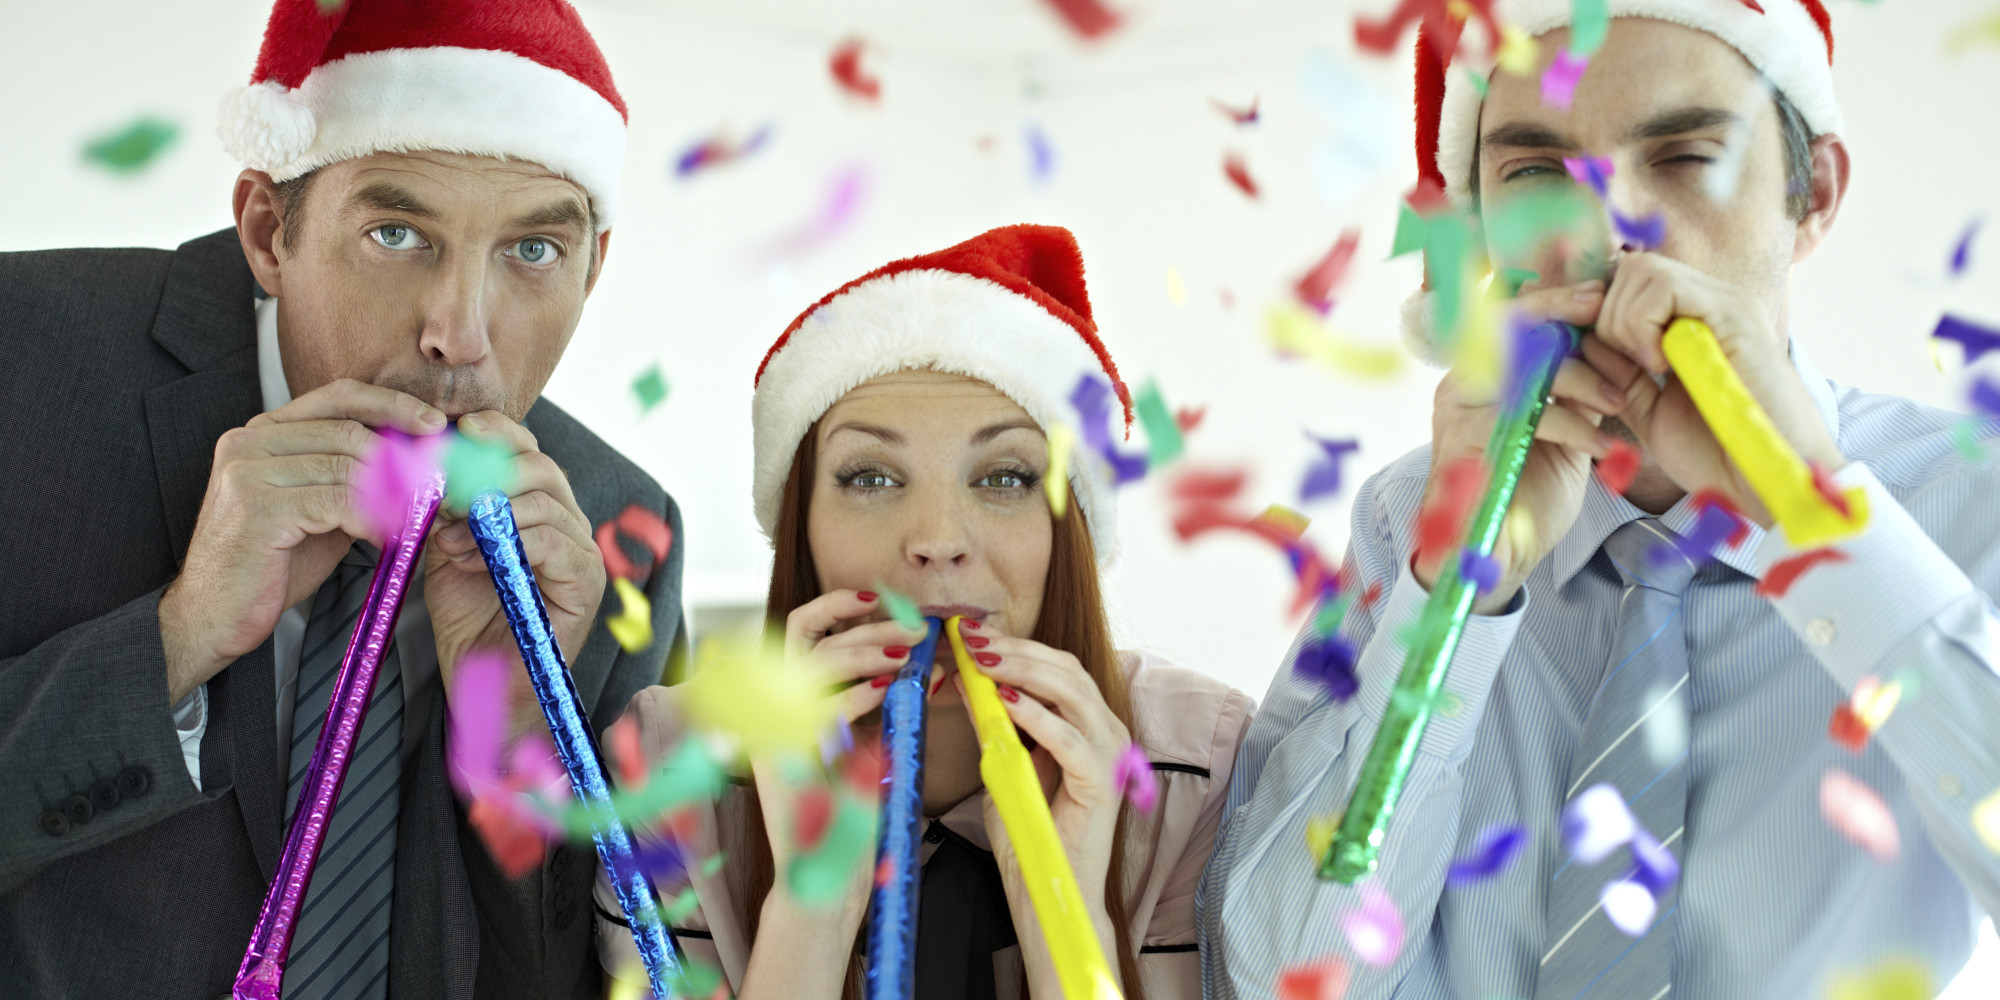 Saving Money on your Christmas Party | MoonlightMistletoe